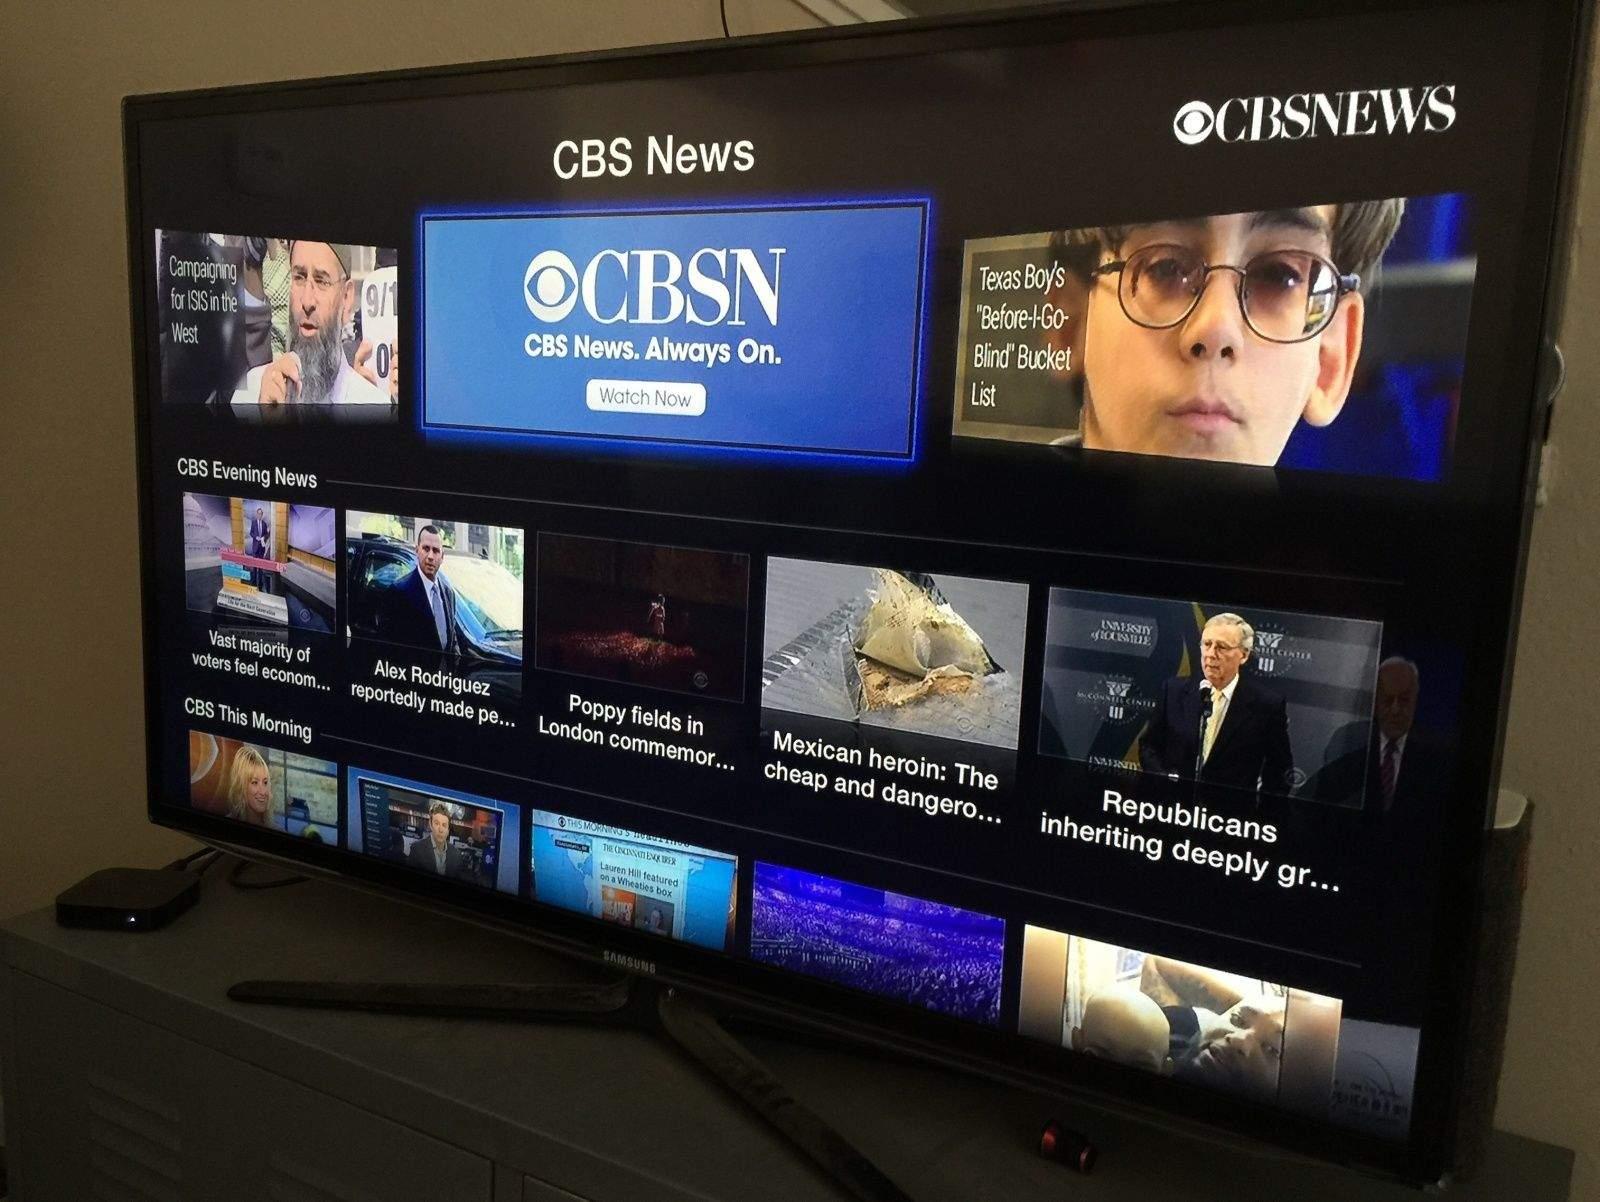 CBS News now streams live on your Apple TV